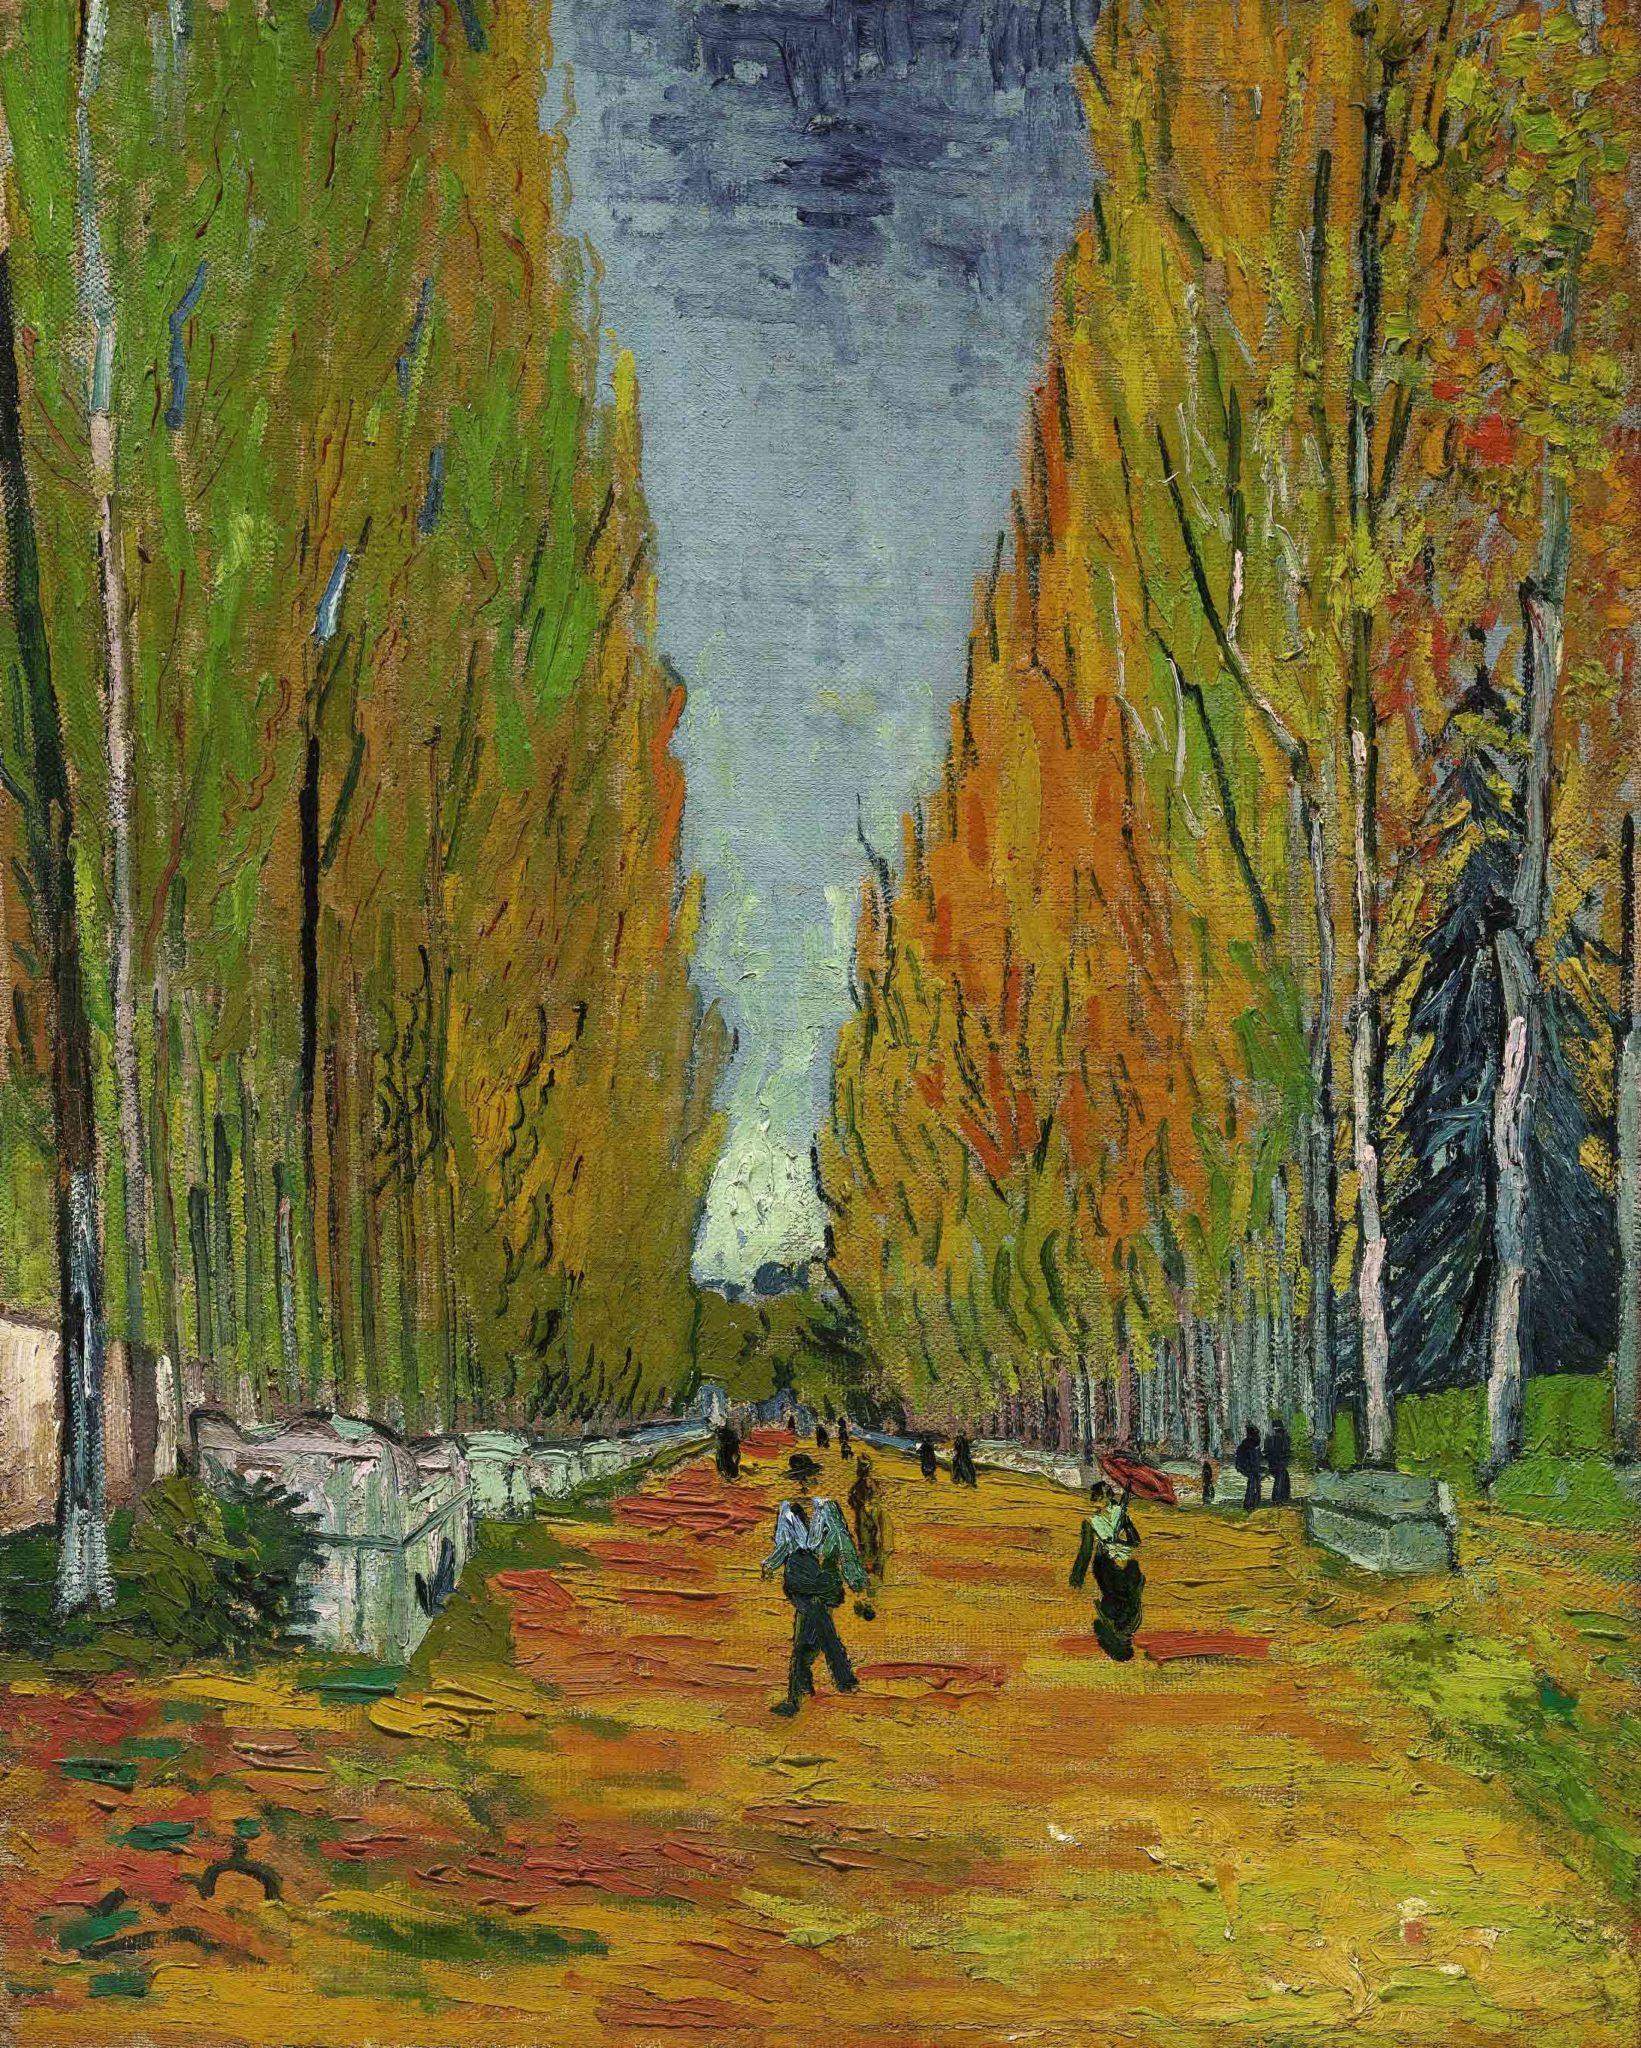 Van Gogh L'ALLÉE DES ALYSCAMPS - ArtsLife